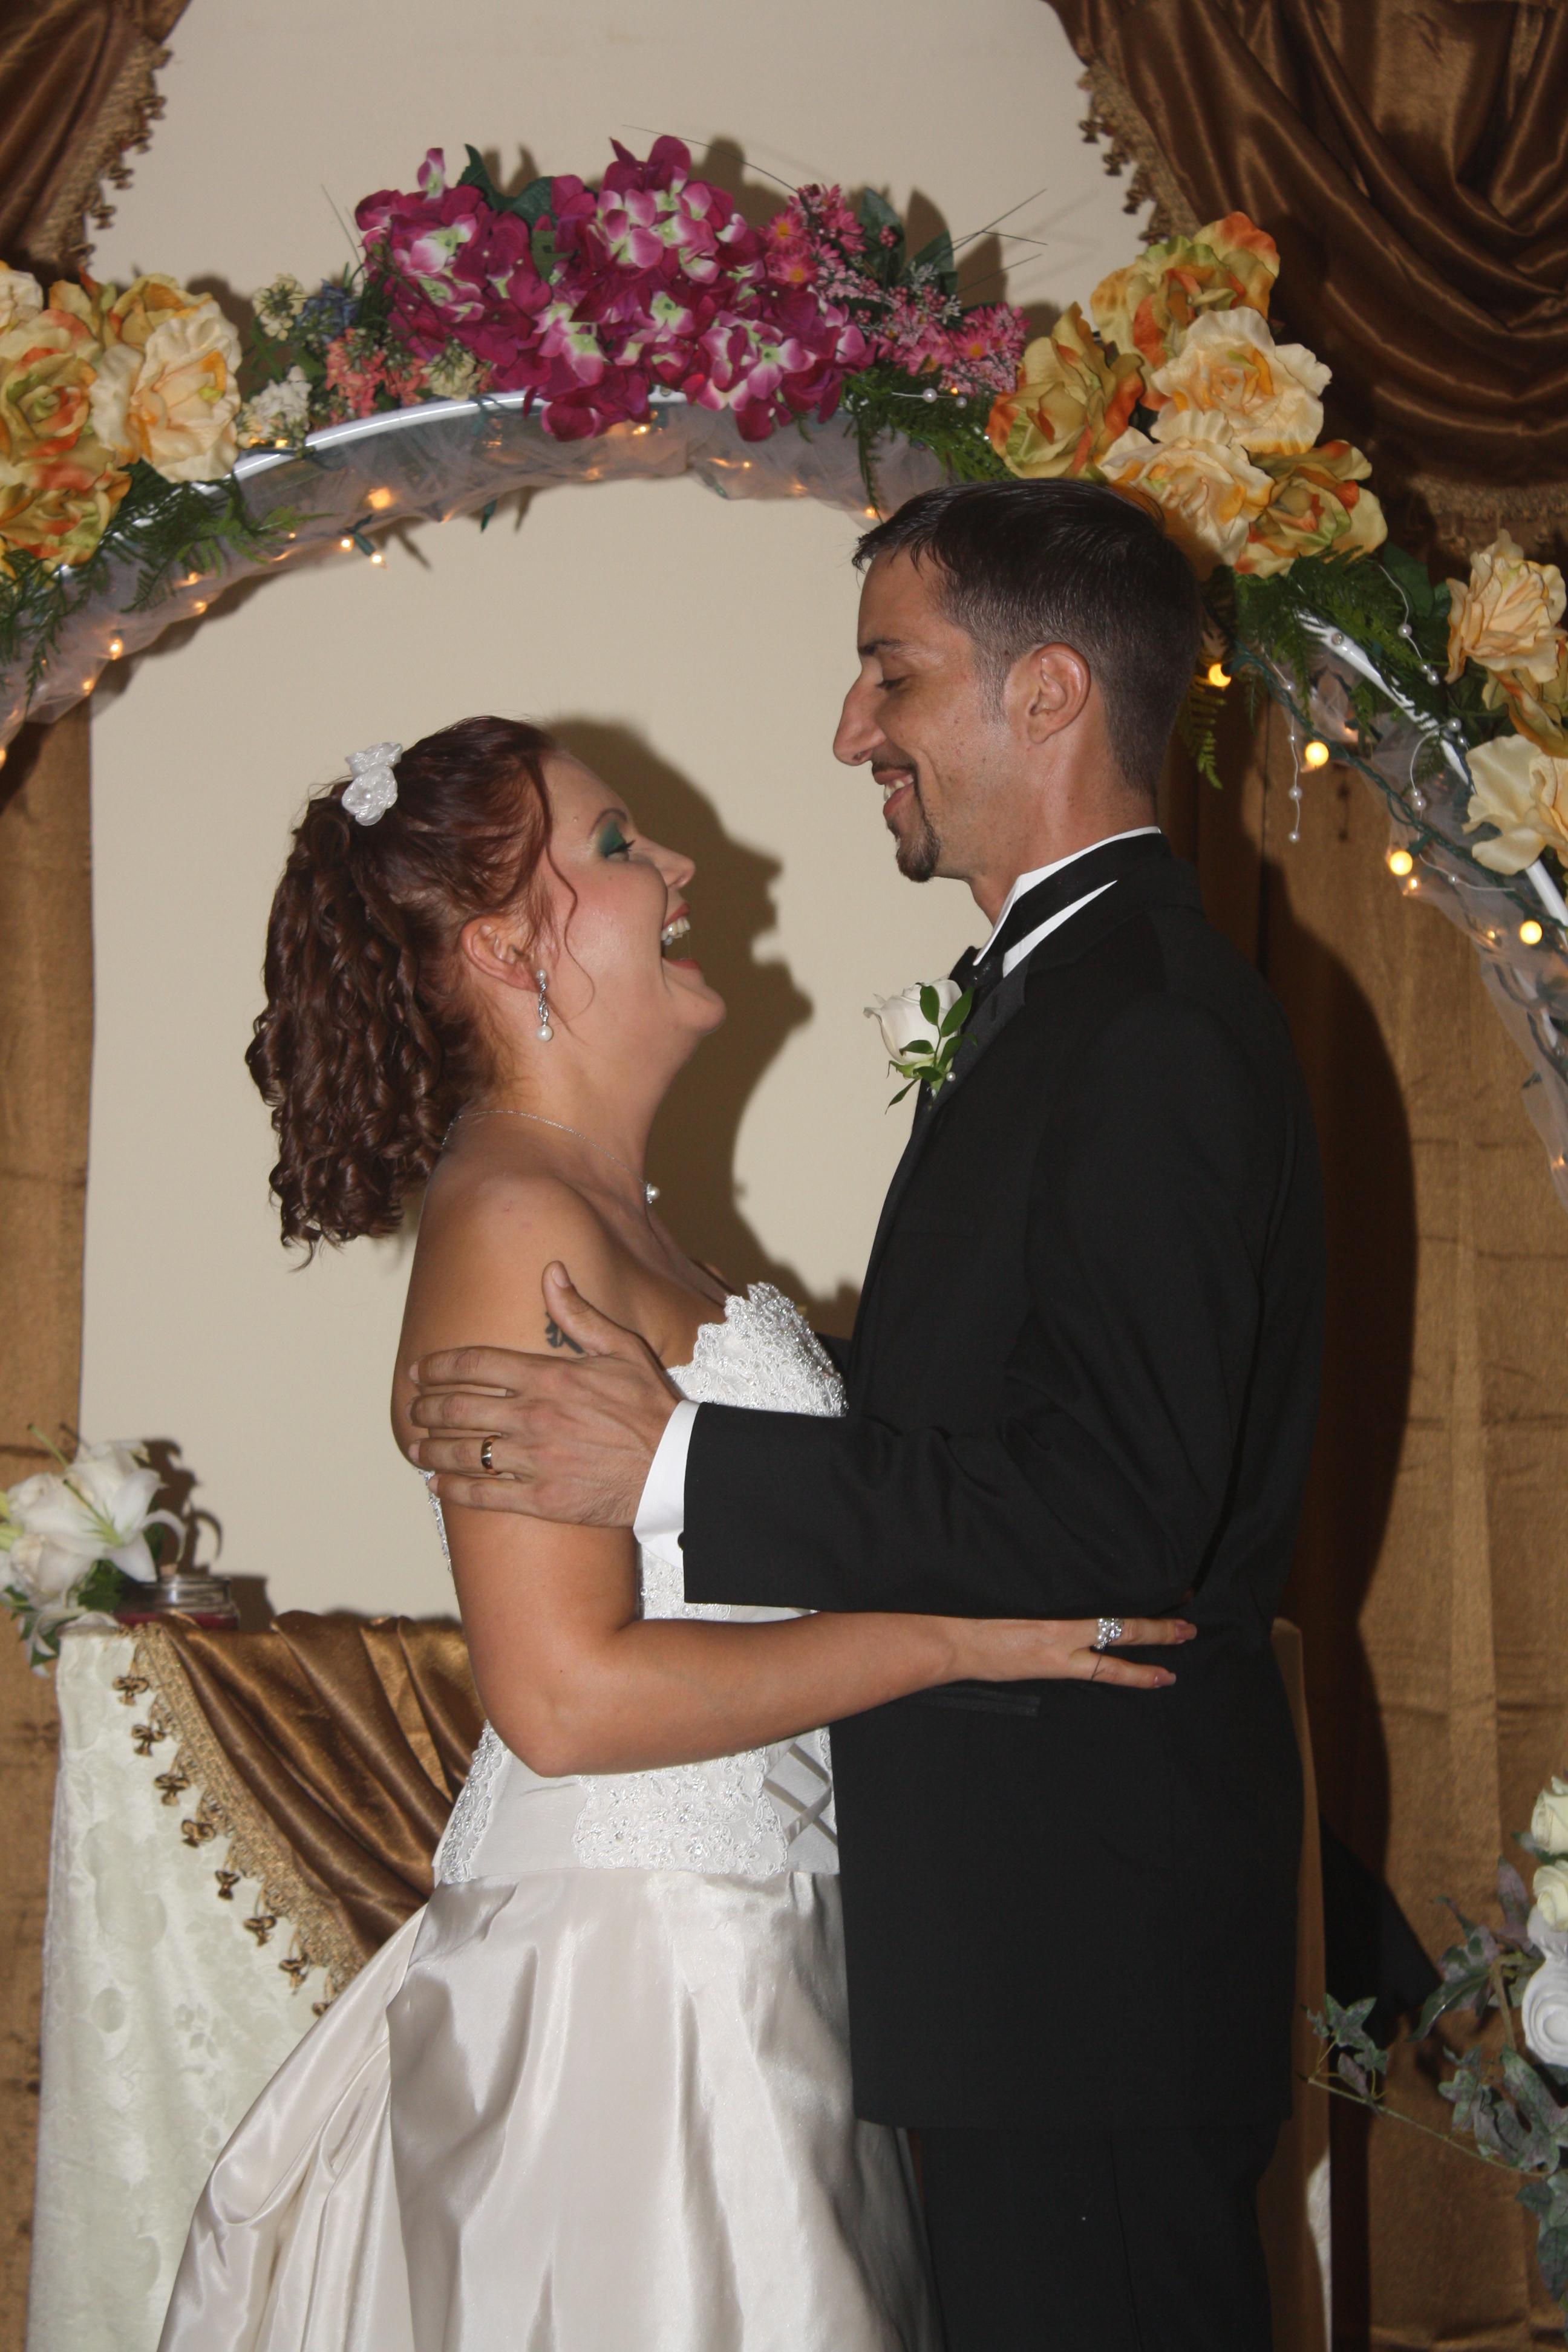 wedding chapel vows